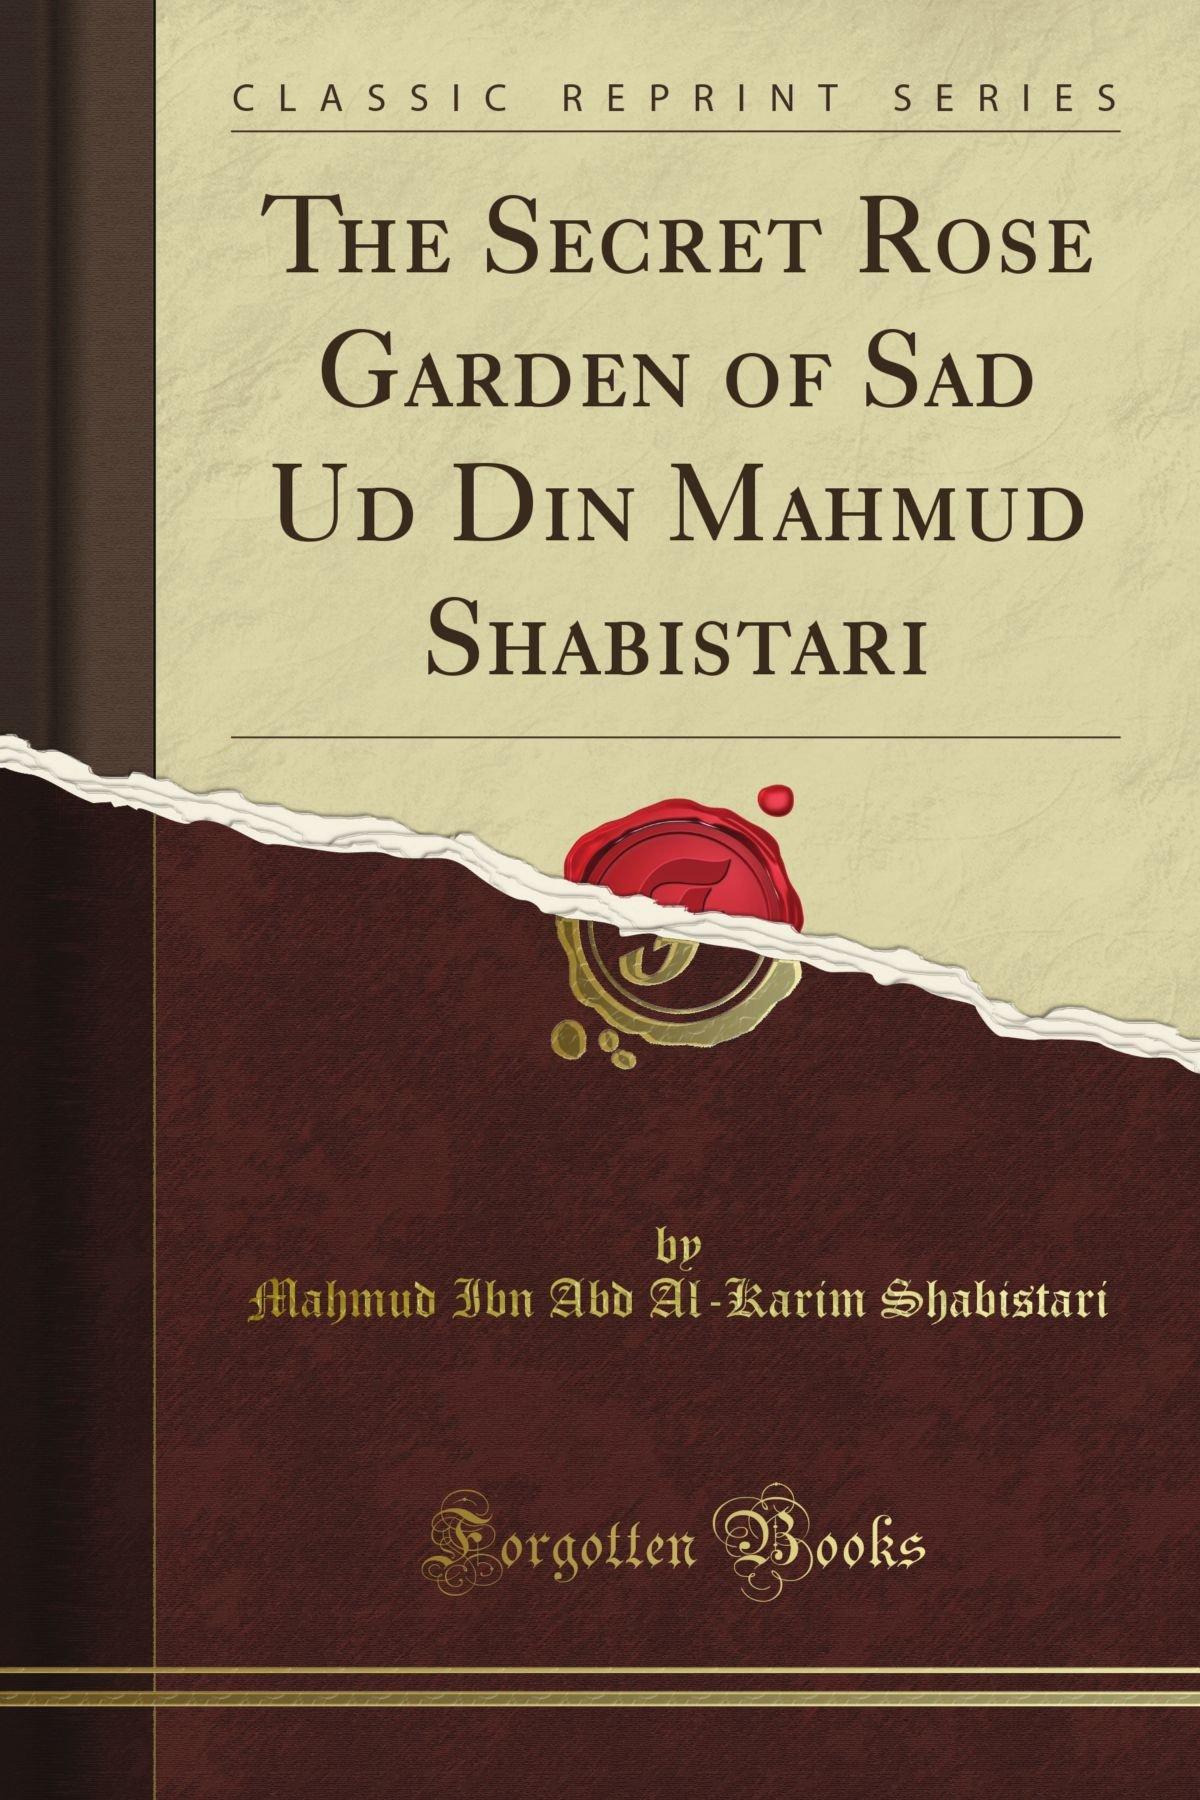 The Secret Rose Garden of Sad Ud Din Mahmud Shabistari